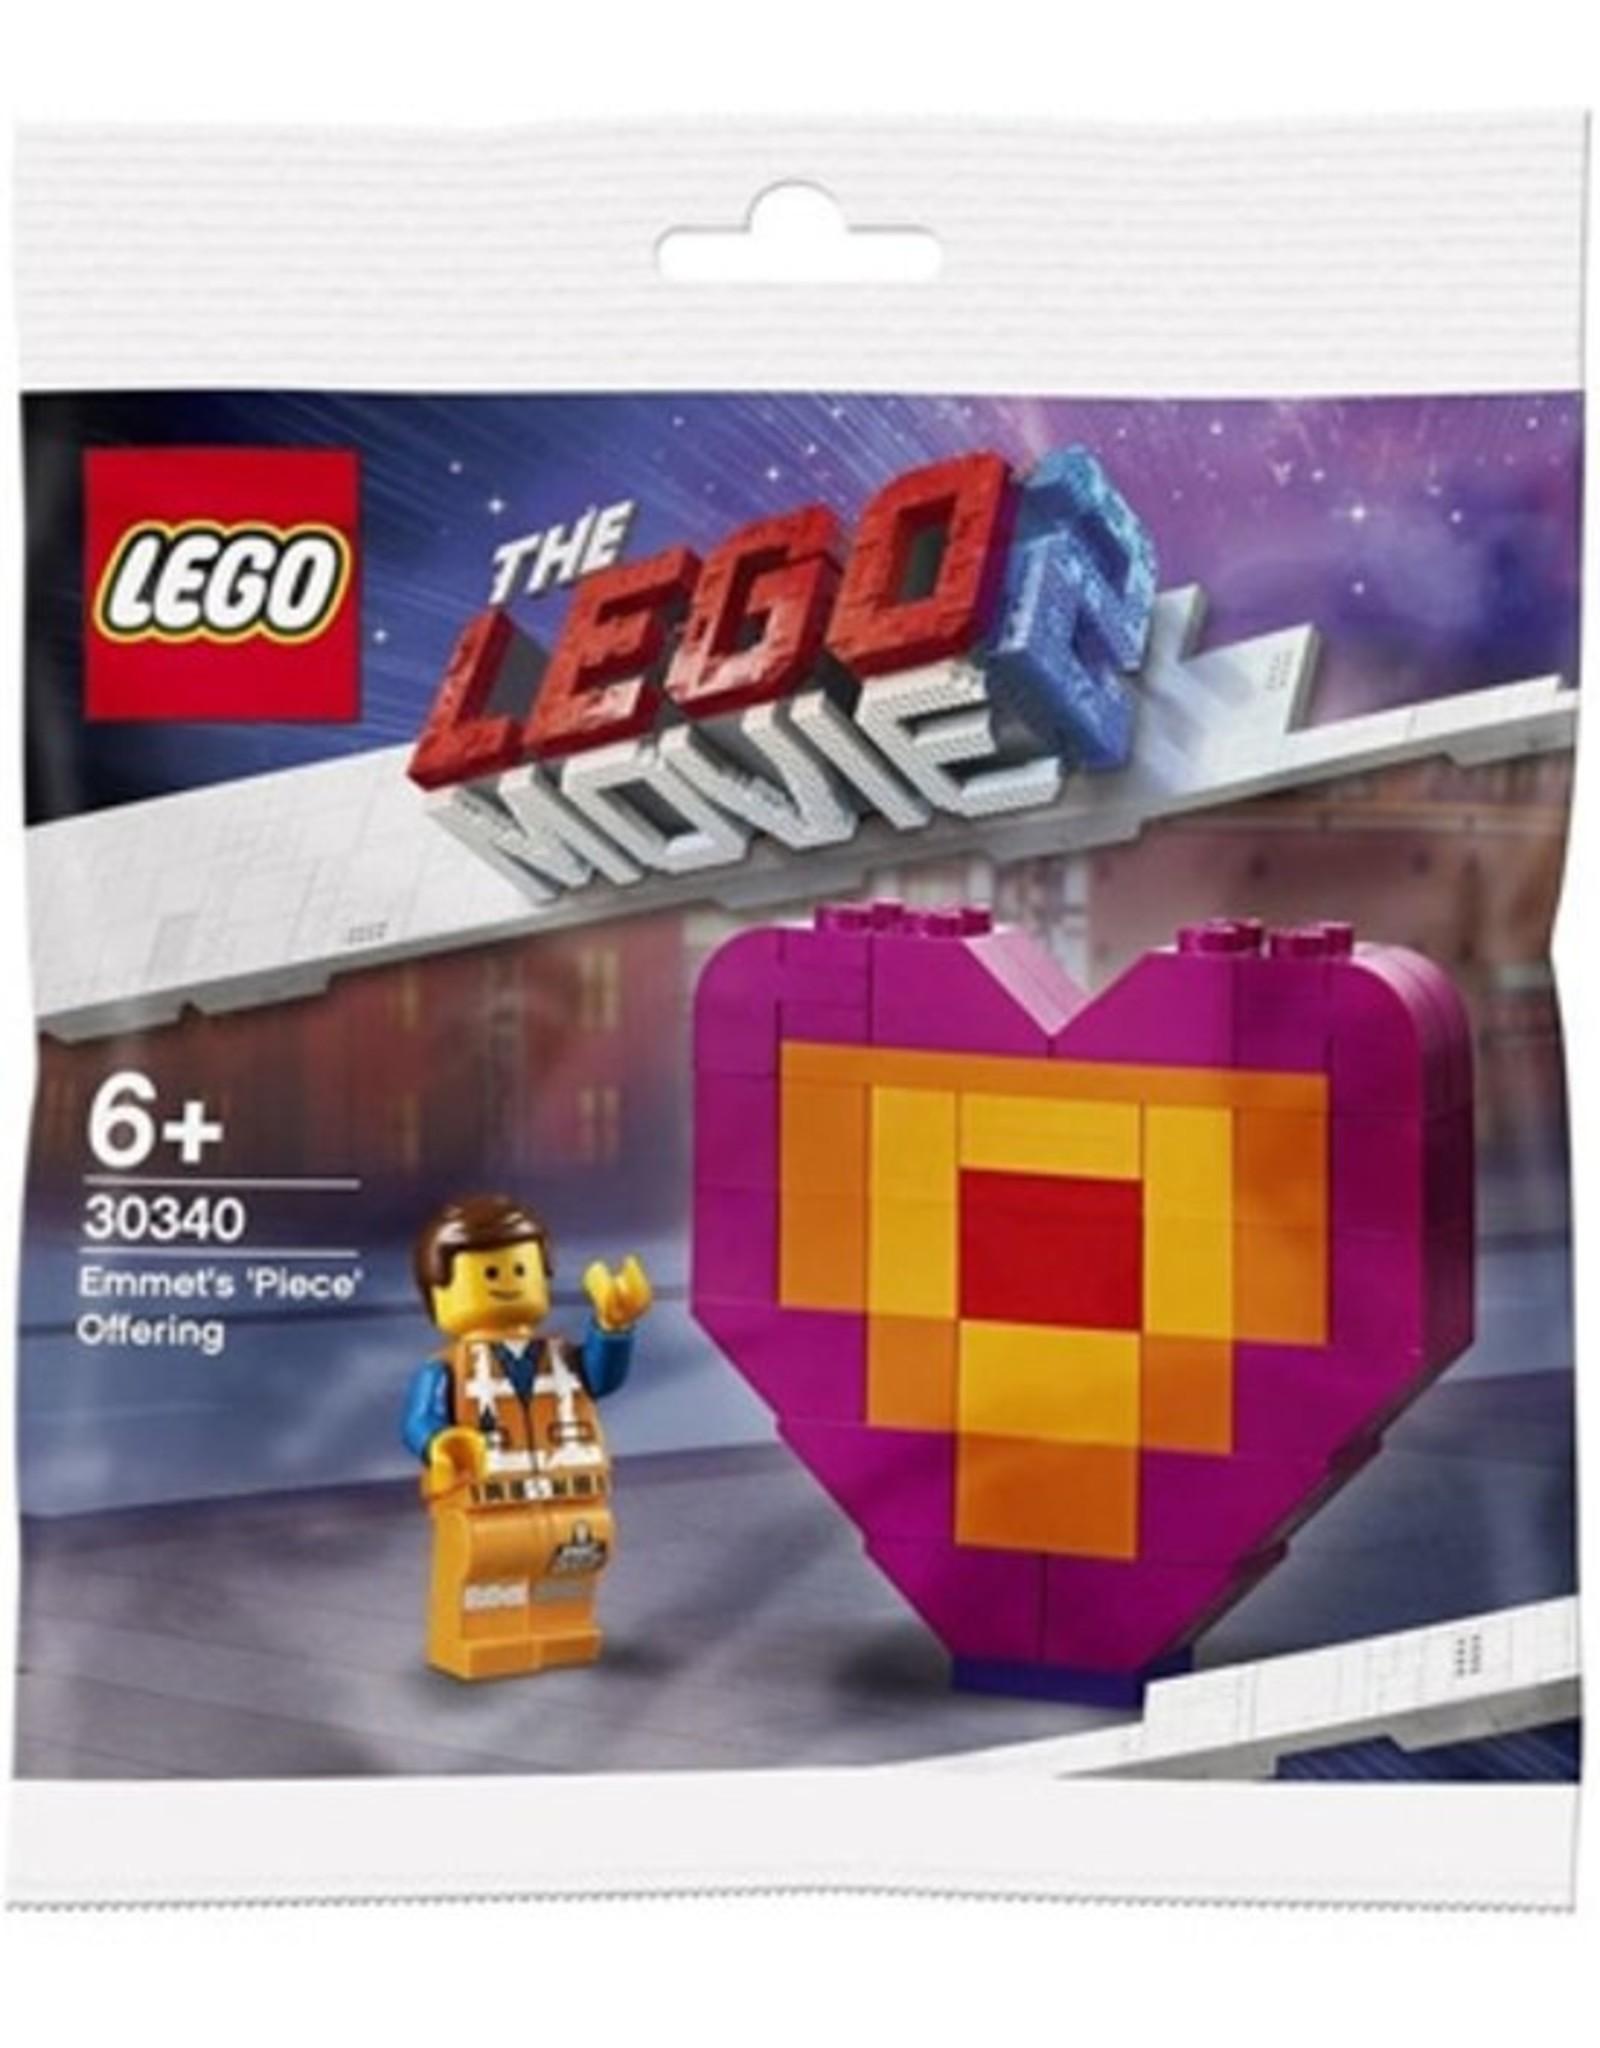 LEGO LEGO 30340 Emmet's 'Piece' Offering (Polybag)